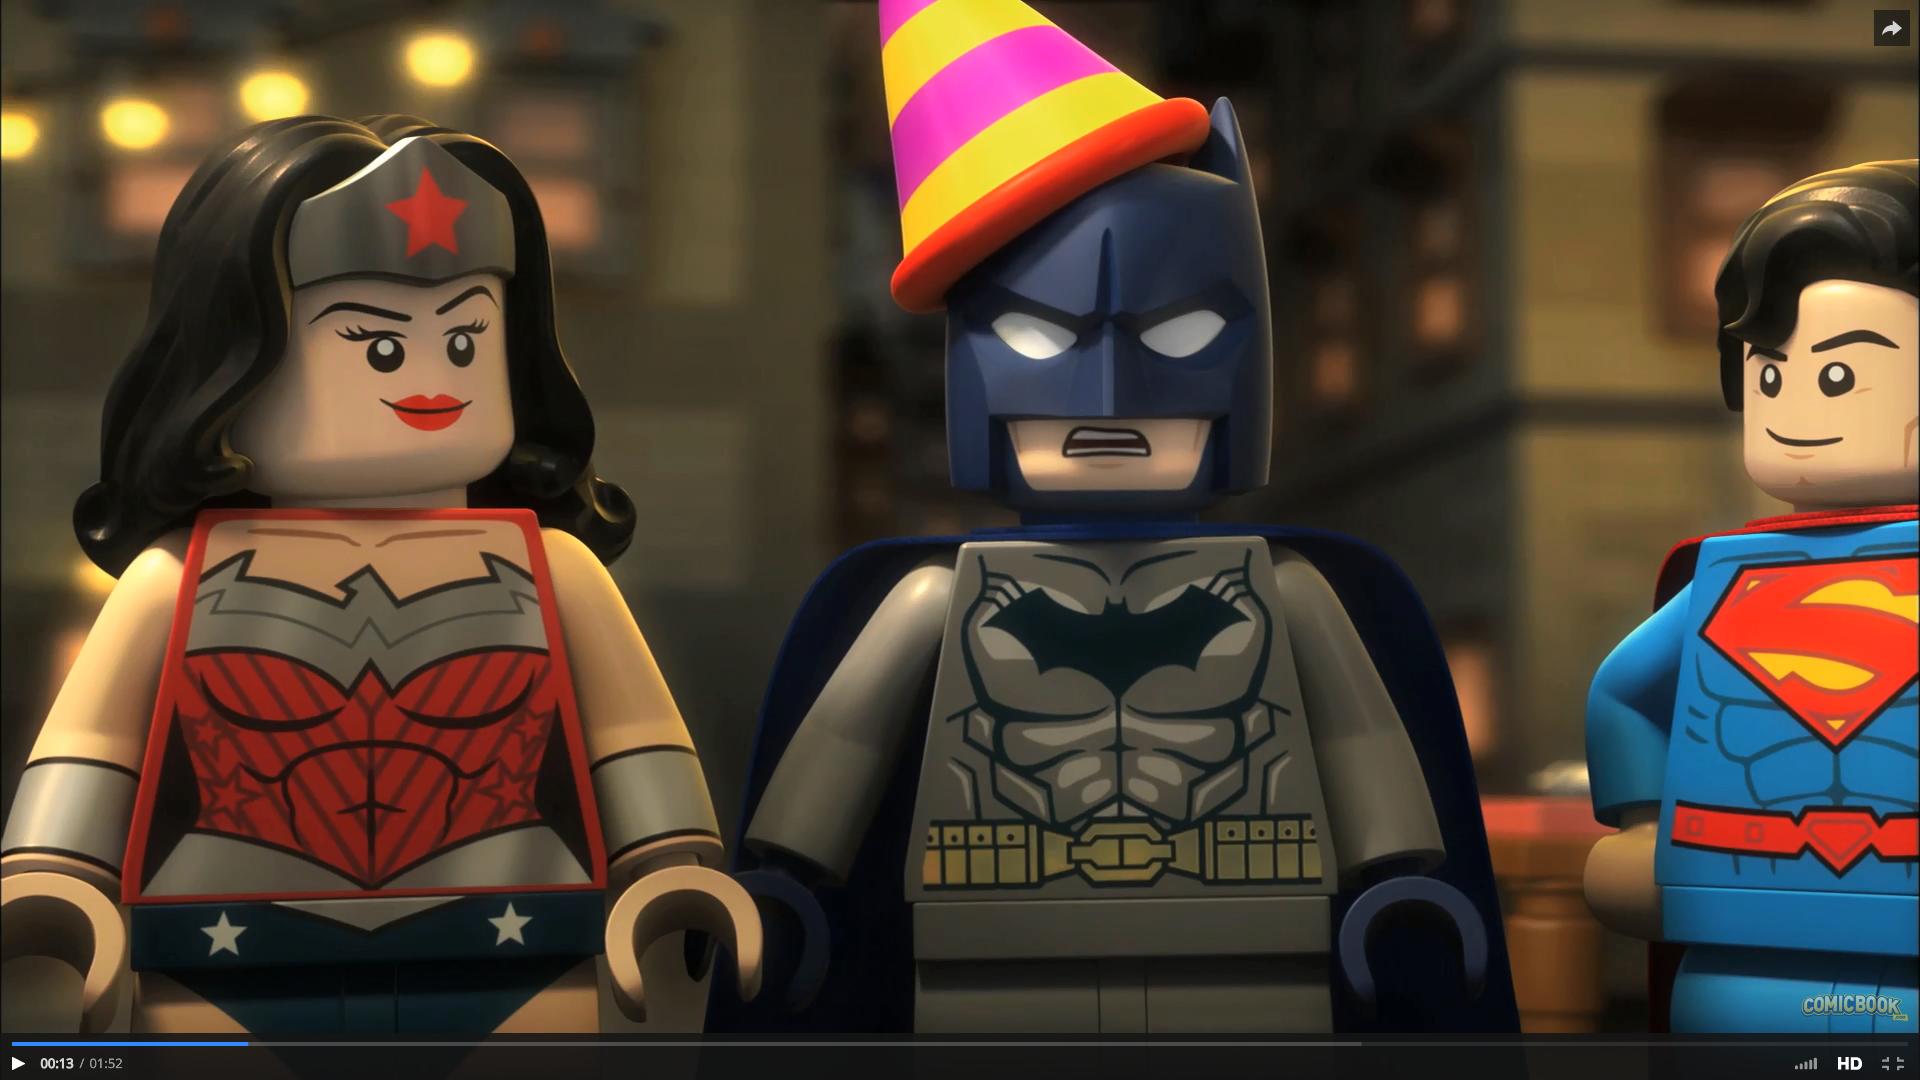 The batman universe trailer released for lego gotham - Super batman movie ...